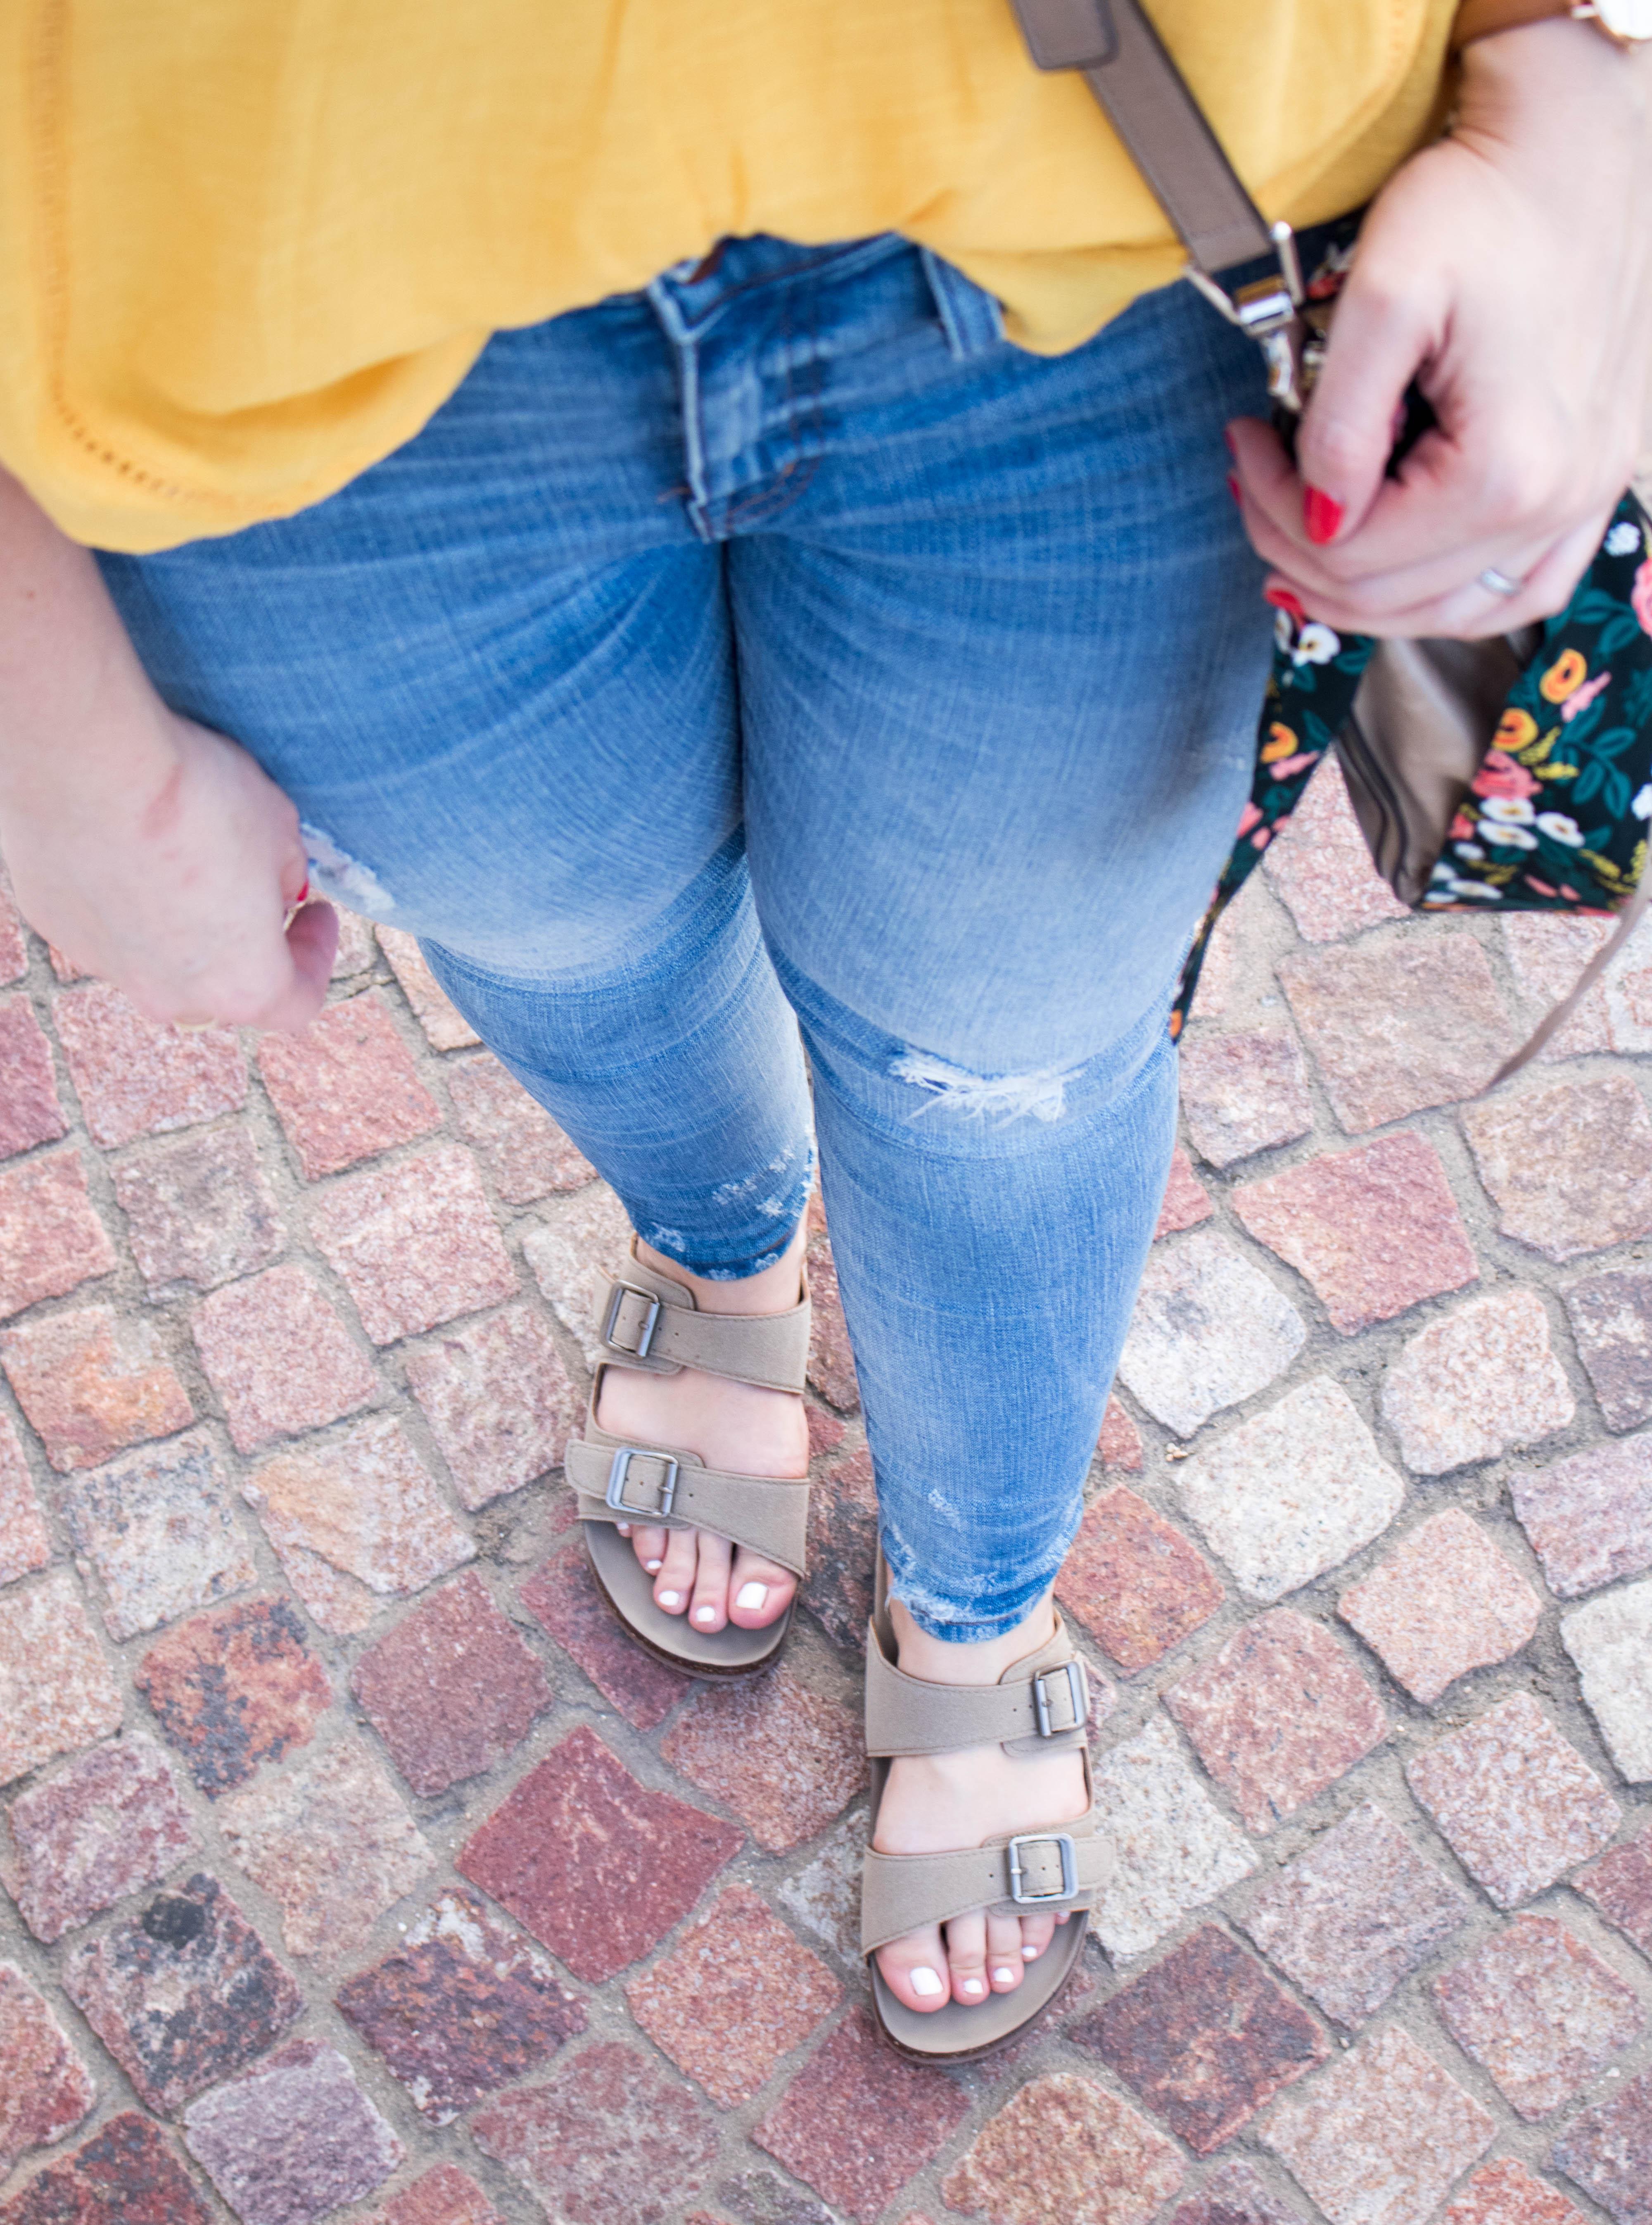 madden nyc birkenstock sandals #sandals #maddennyckohls #kohls